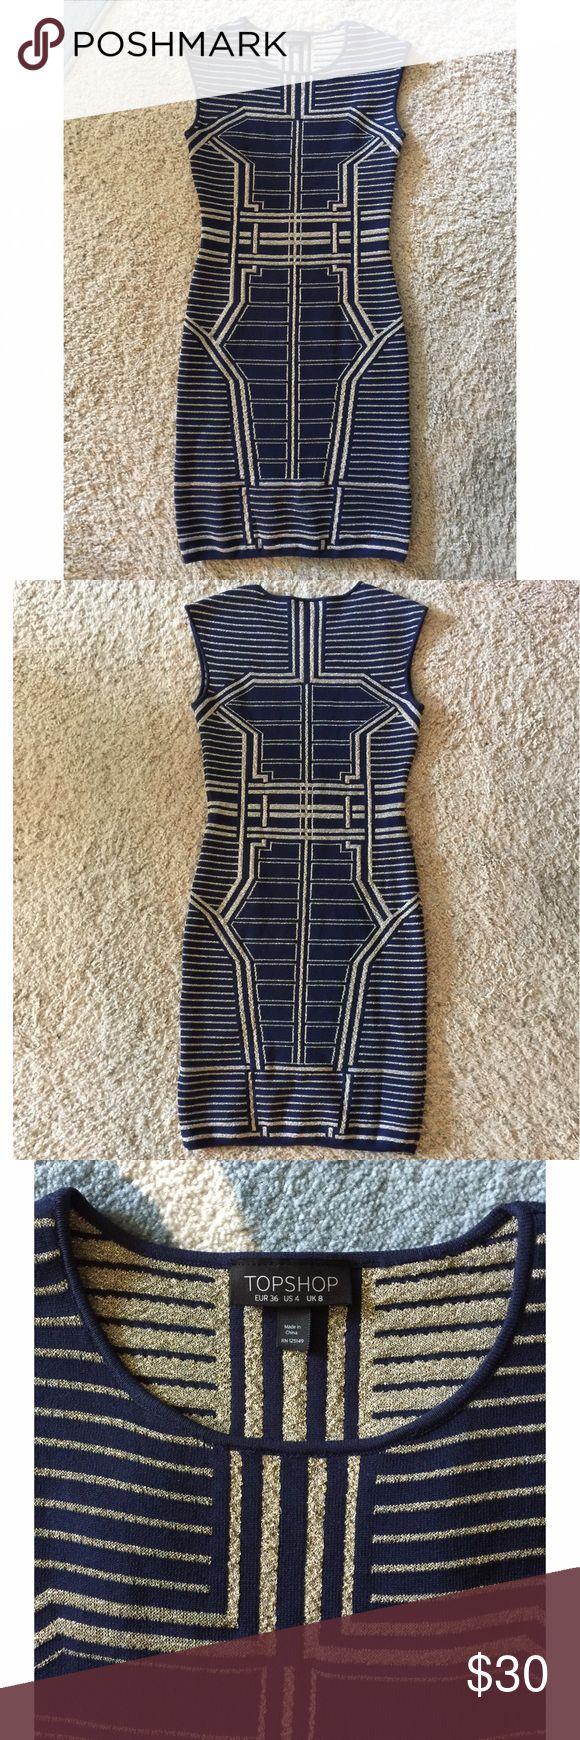 ⭐️BODYCON DRESS⭐️ Navy & metallic gold bodycon dress. Only worn once. Beautiful fitting dress. Topshop Dresses Midi